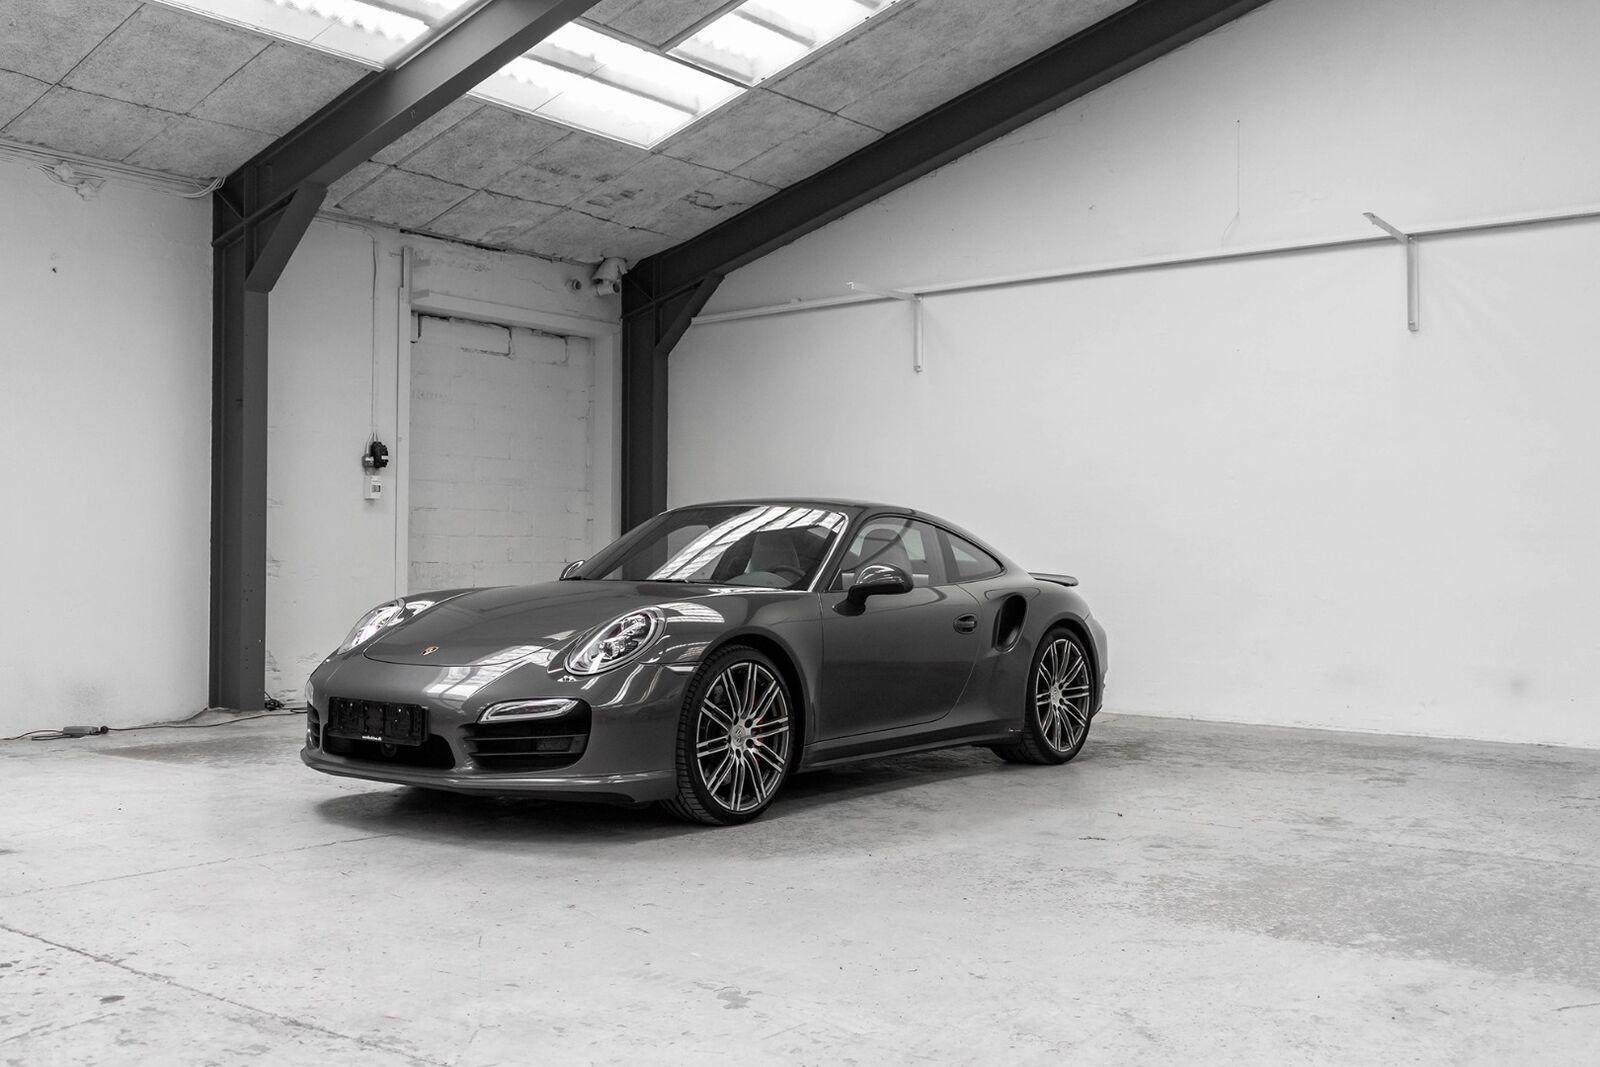 Porsche 911 Turbo 3,8 Coupé PDK 2d - 4.796 kr.